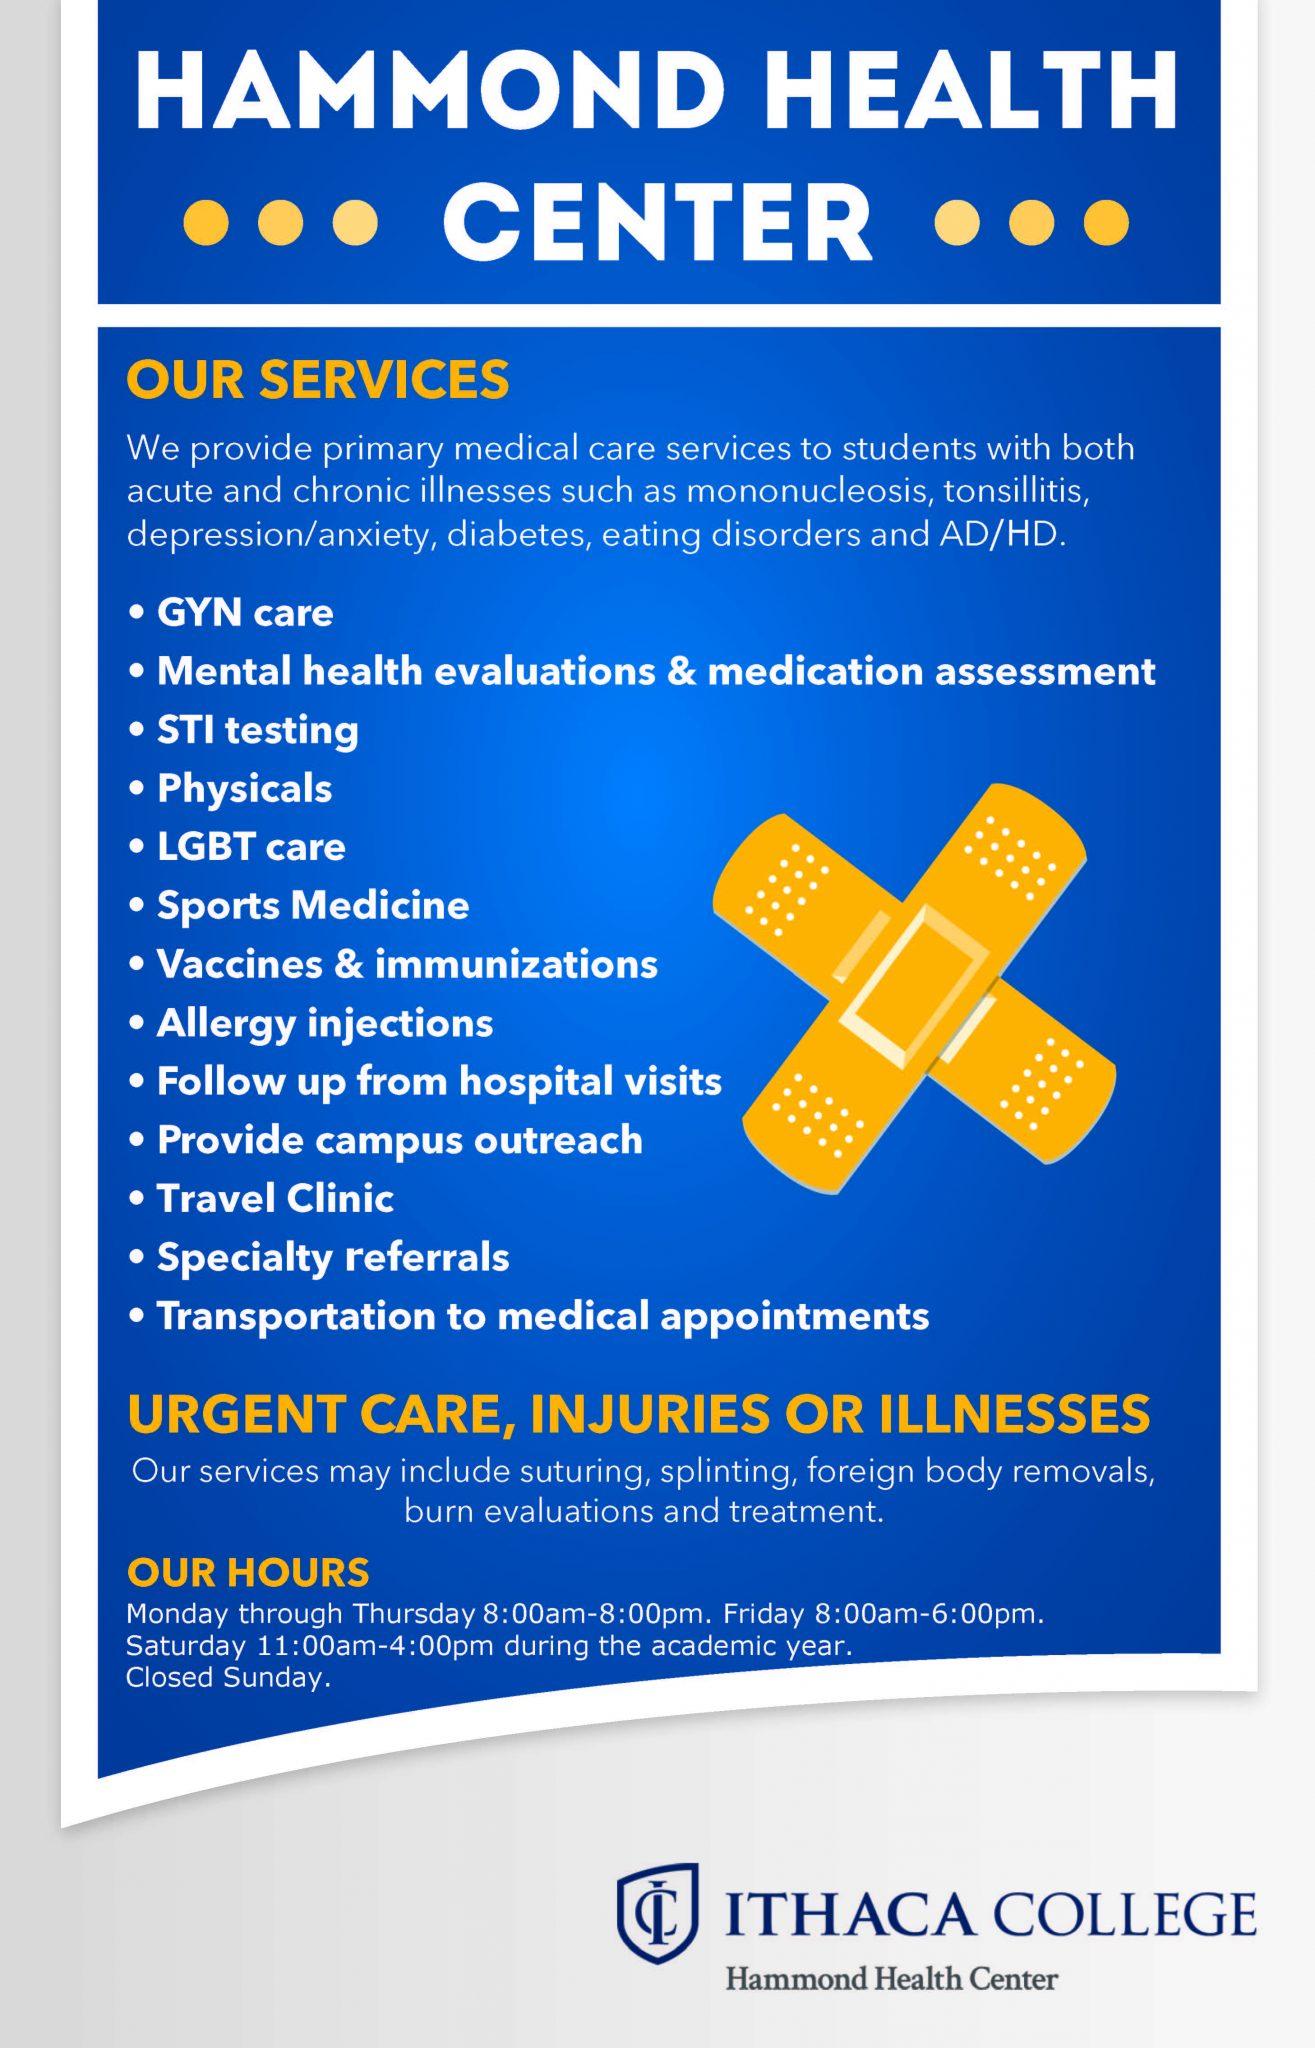 Health Center Services